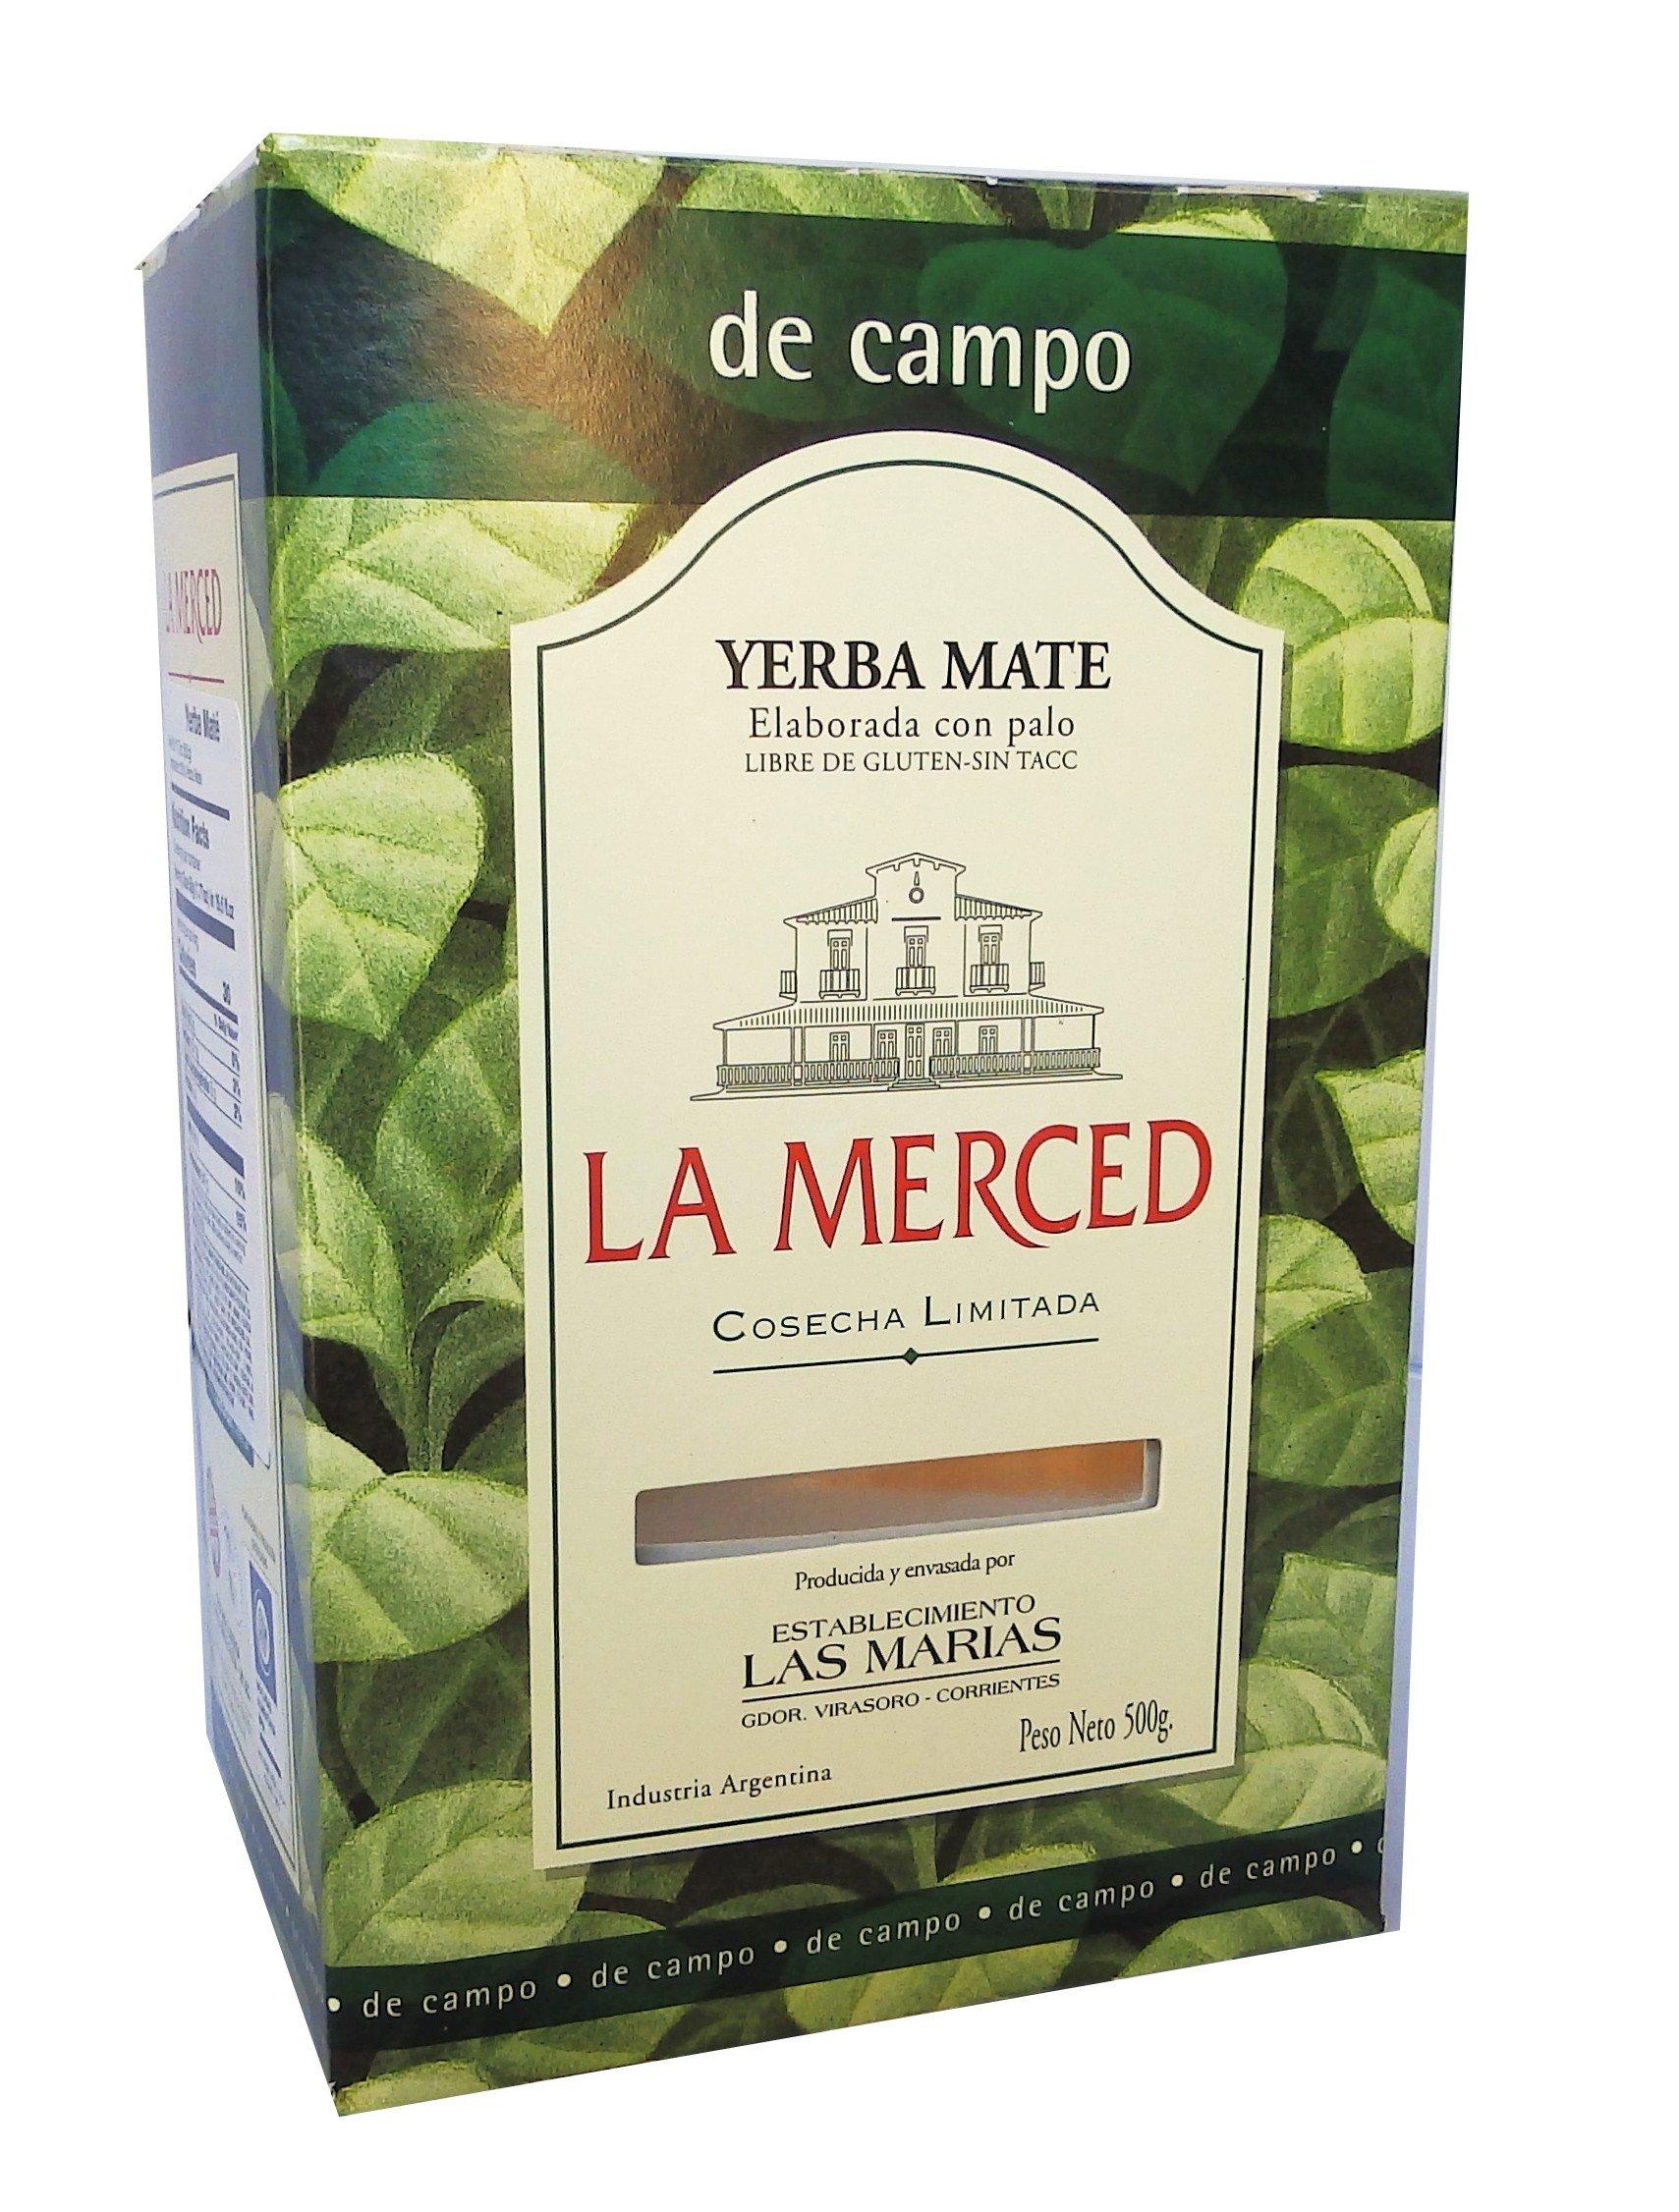 La Merced De Campo Yerba Mate 500 g (1.1 lbs) 6 Pack by La Merced (Image #2)